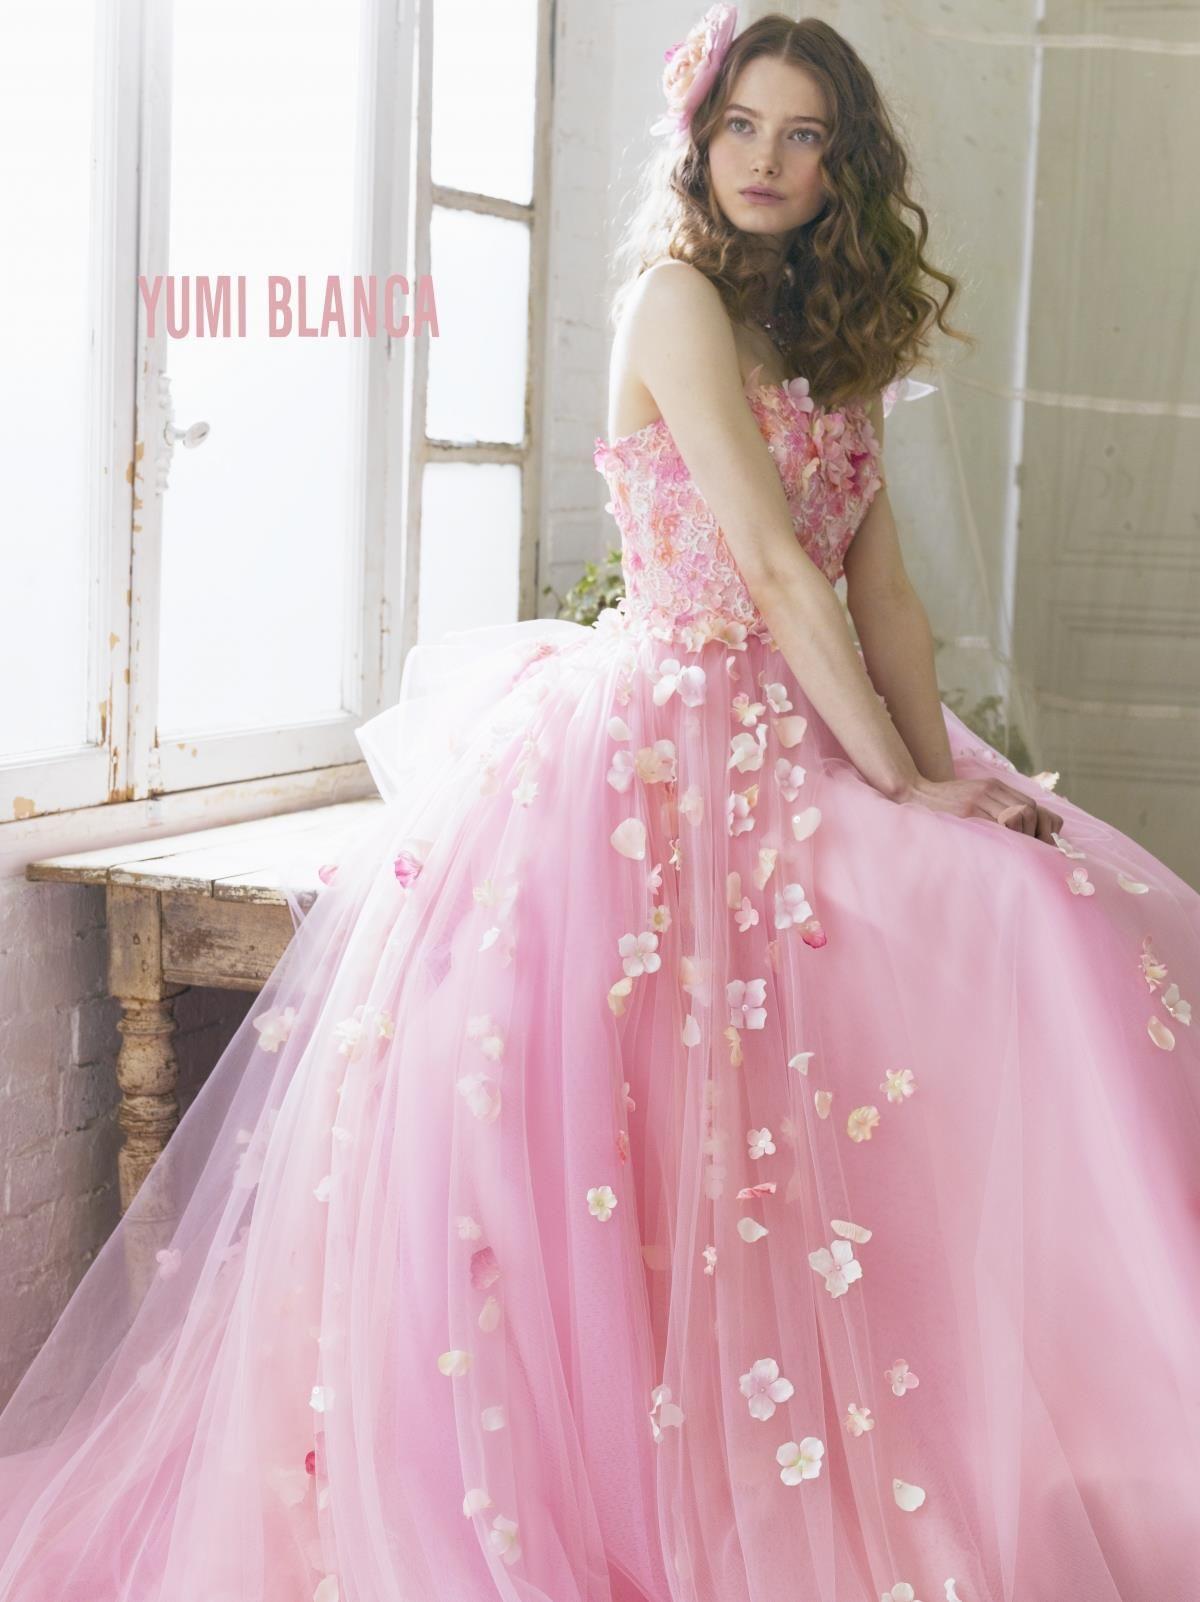 Pin de CelineTan en Dresses | Pinterest